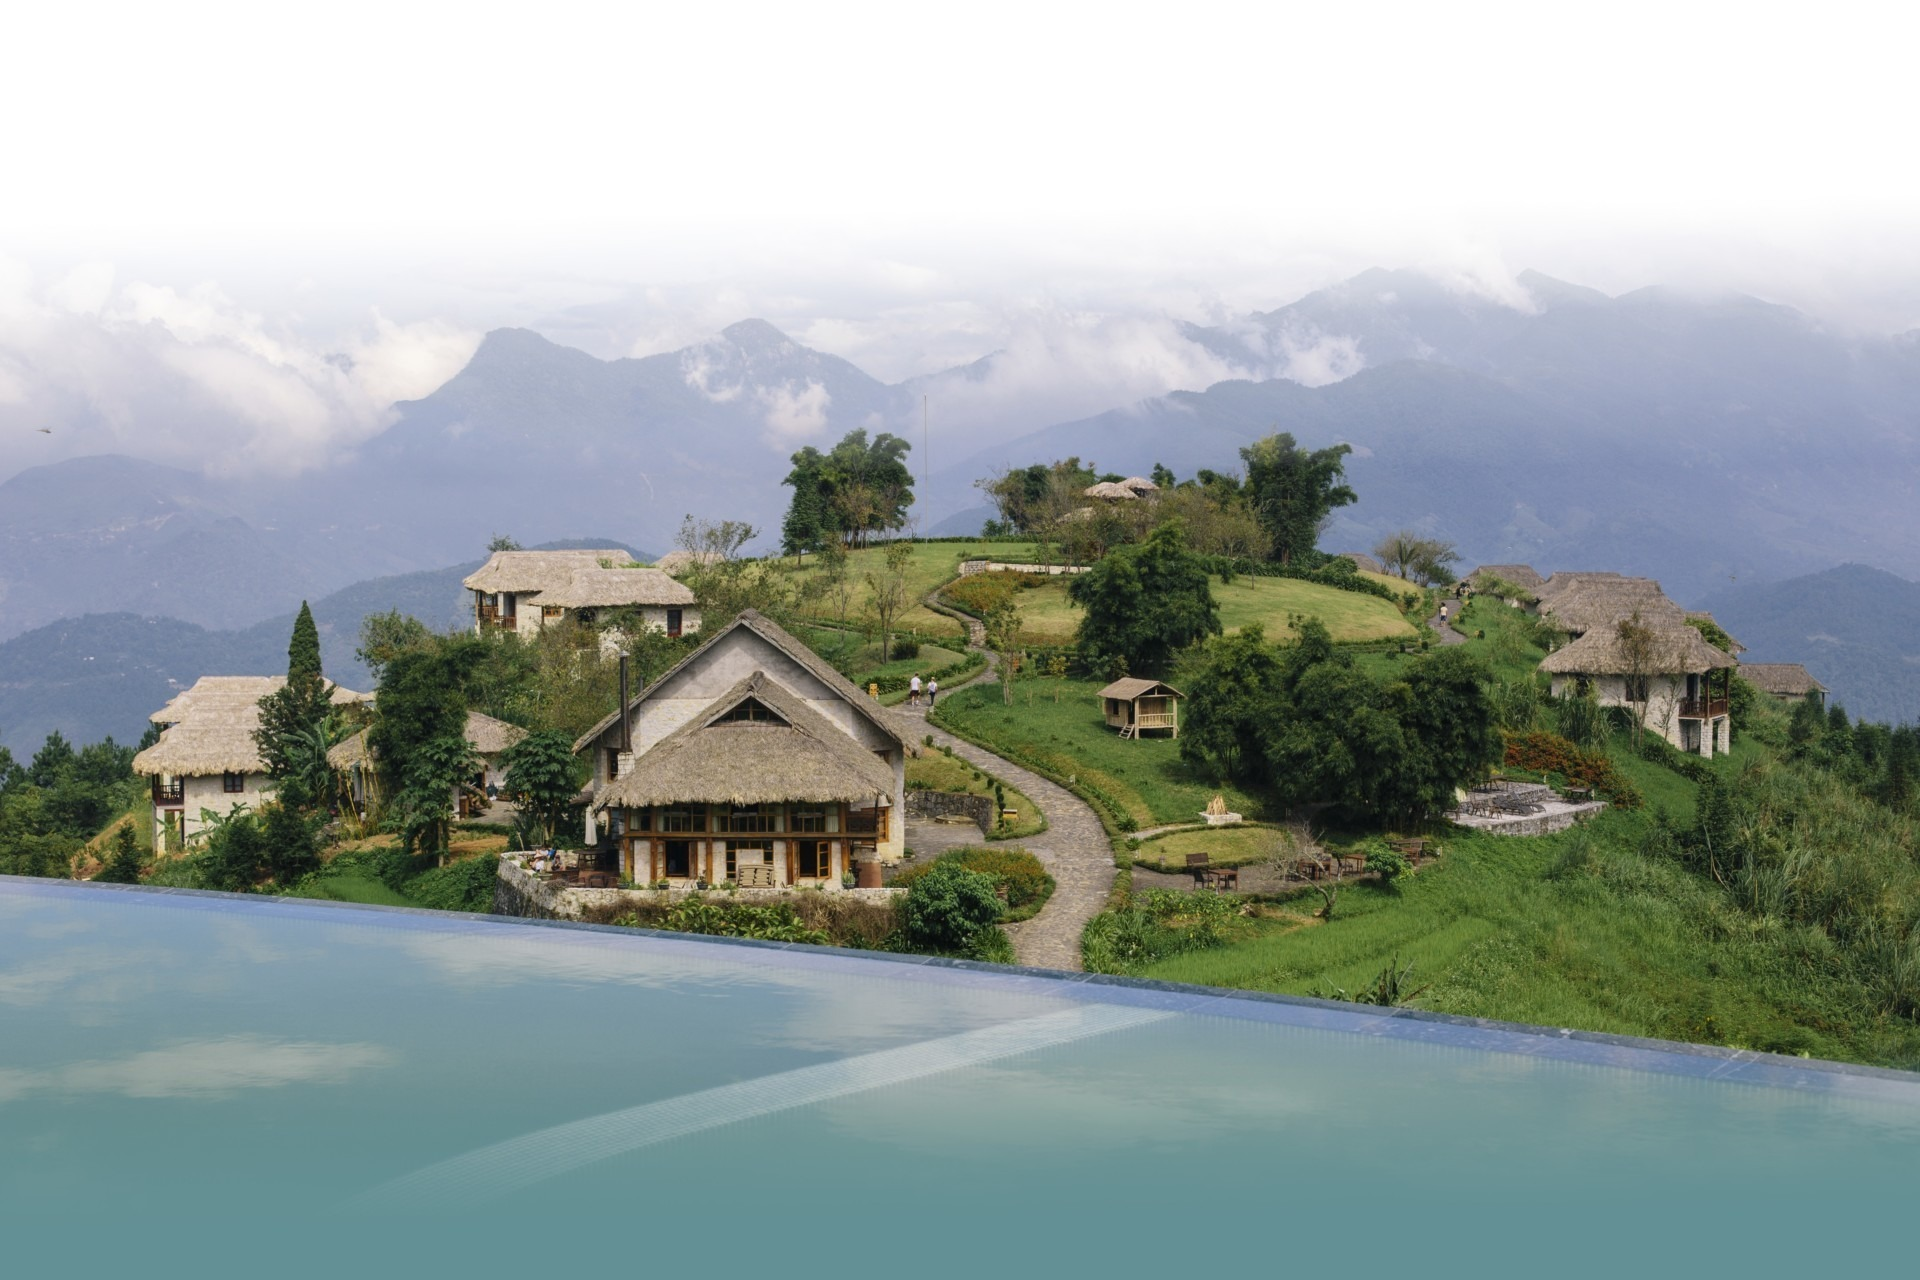 Topas Ecolodge - Sapa - National Geographic Unique Lodges - Pool - faded 2